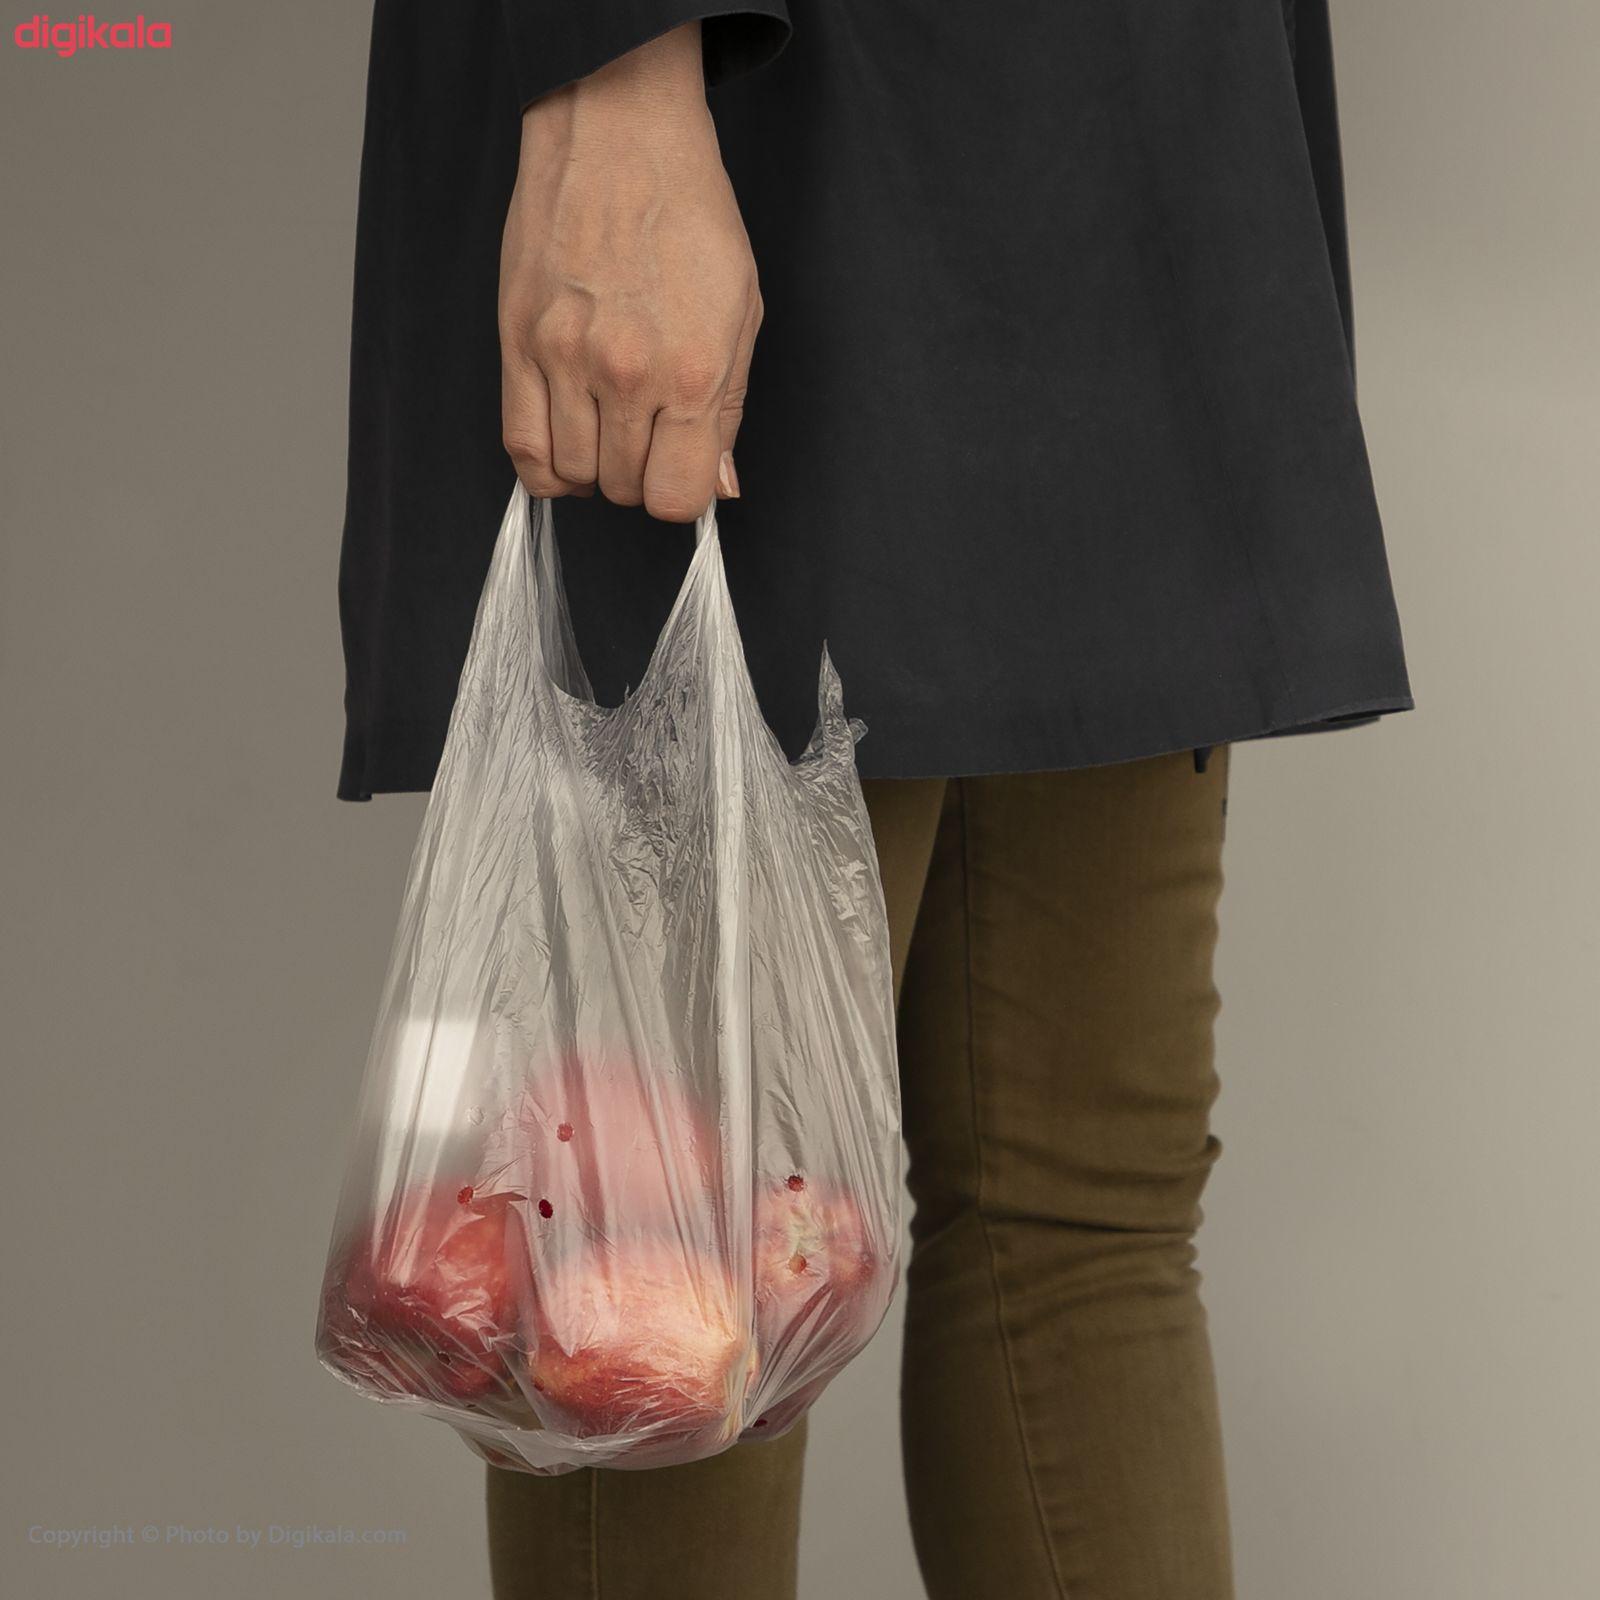 سیب قرمز دماوند فله - 1 کیلوگرم main 1 4